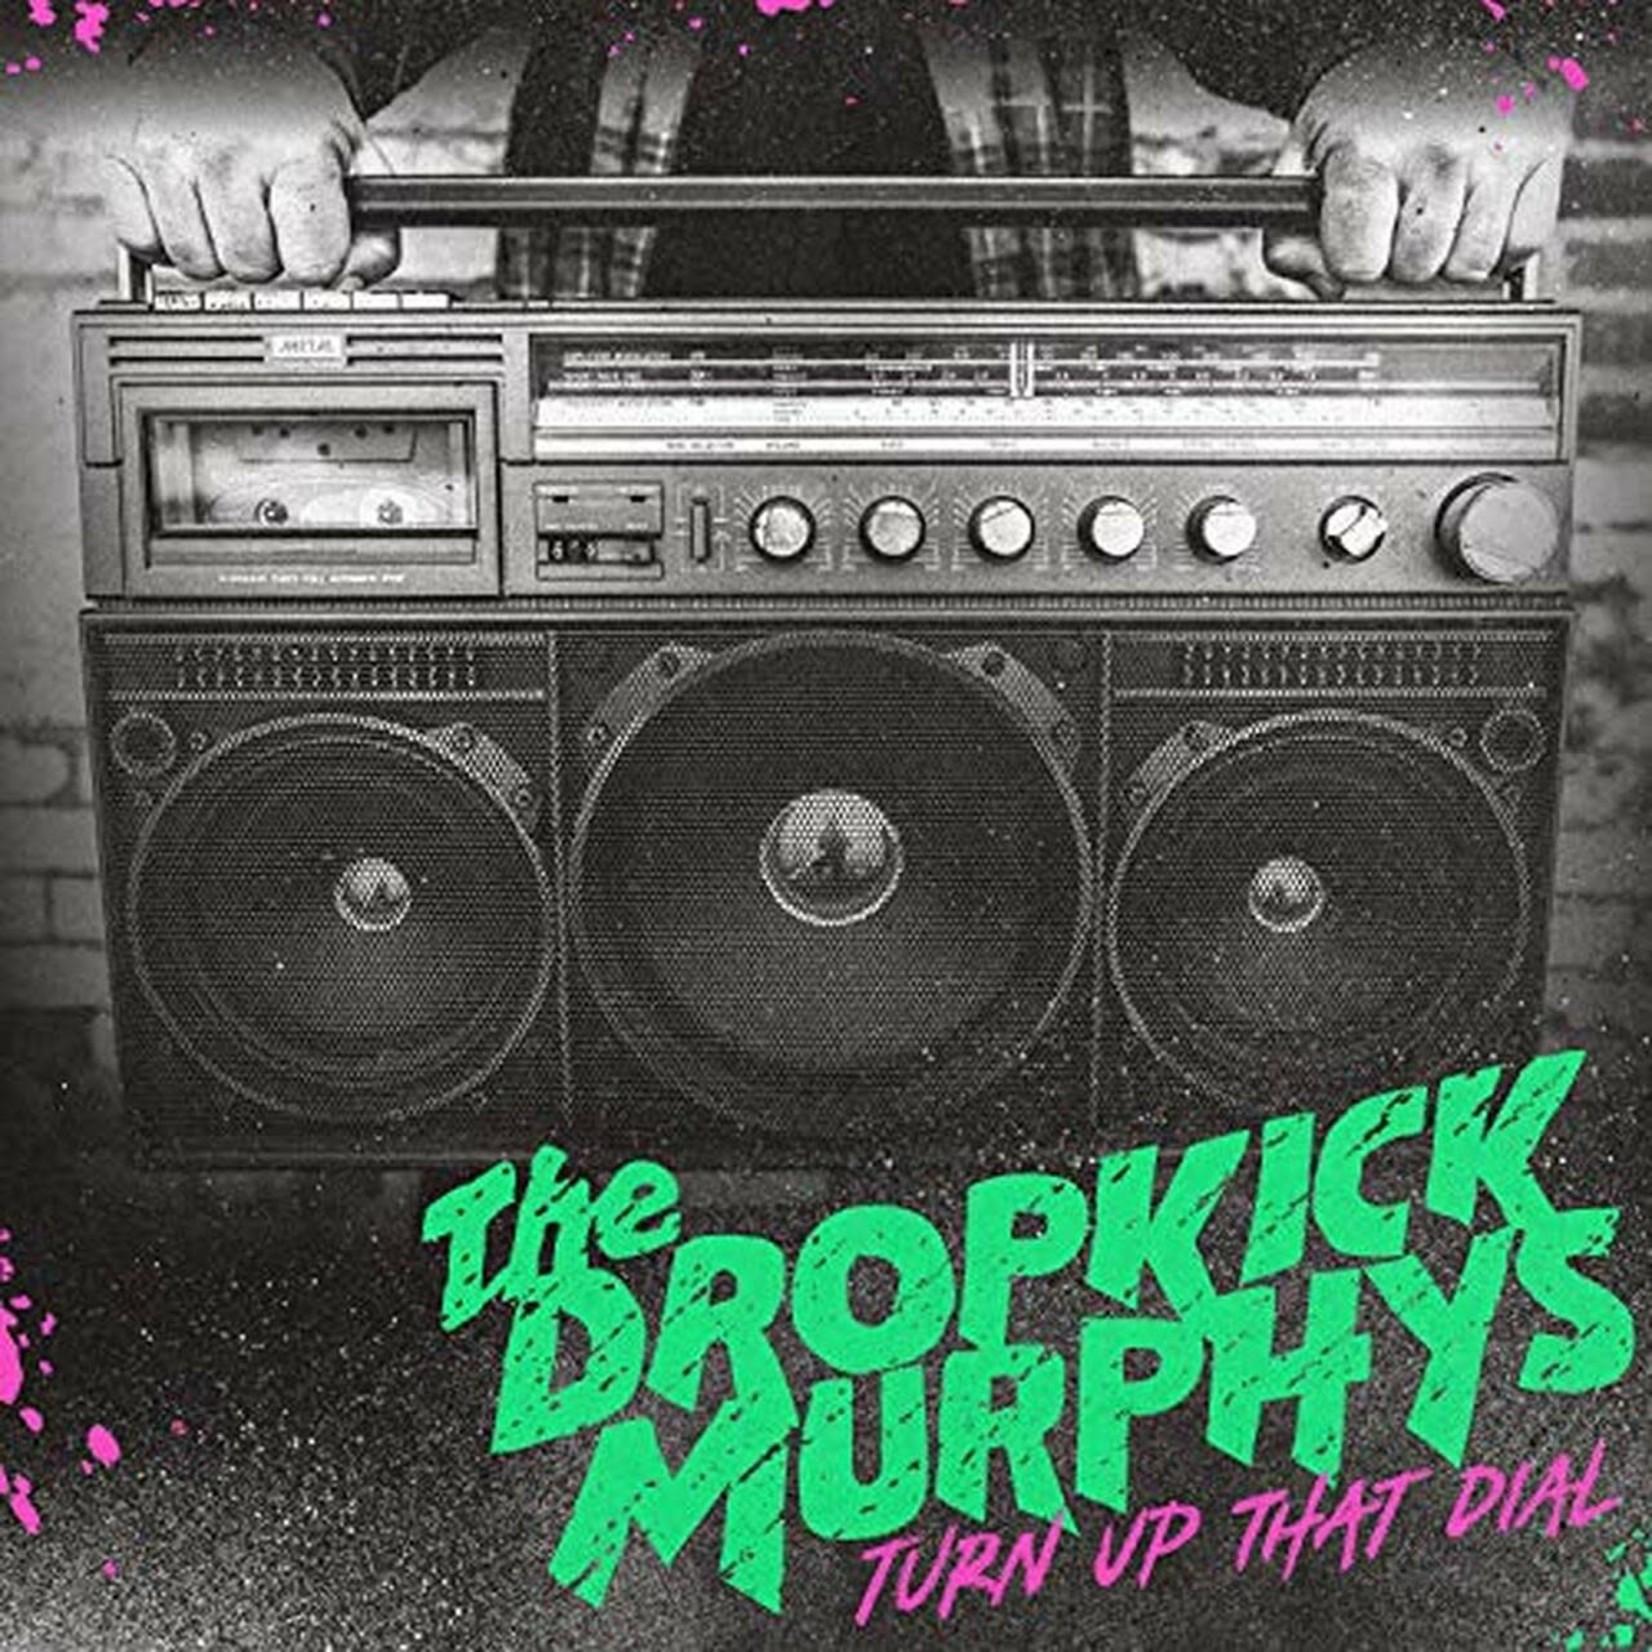 [New] Dropkick Murphys: Turn Up That Dial